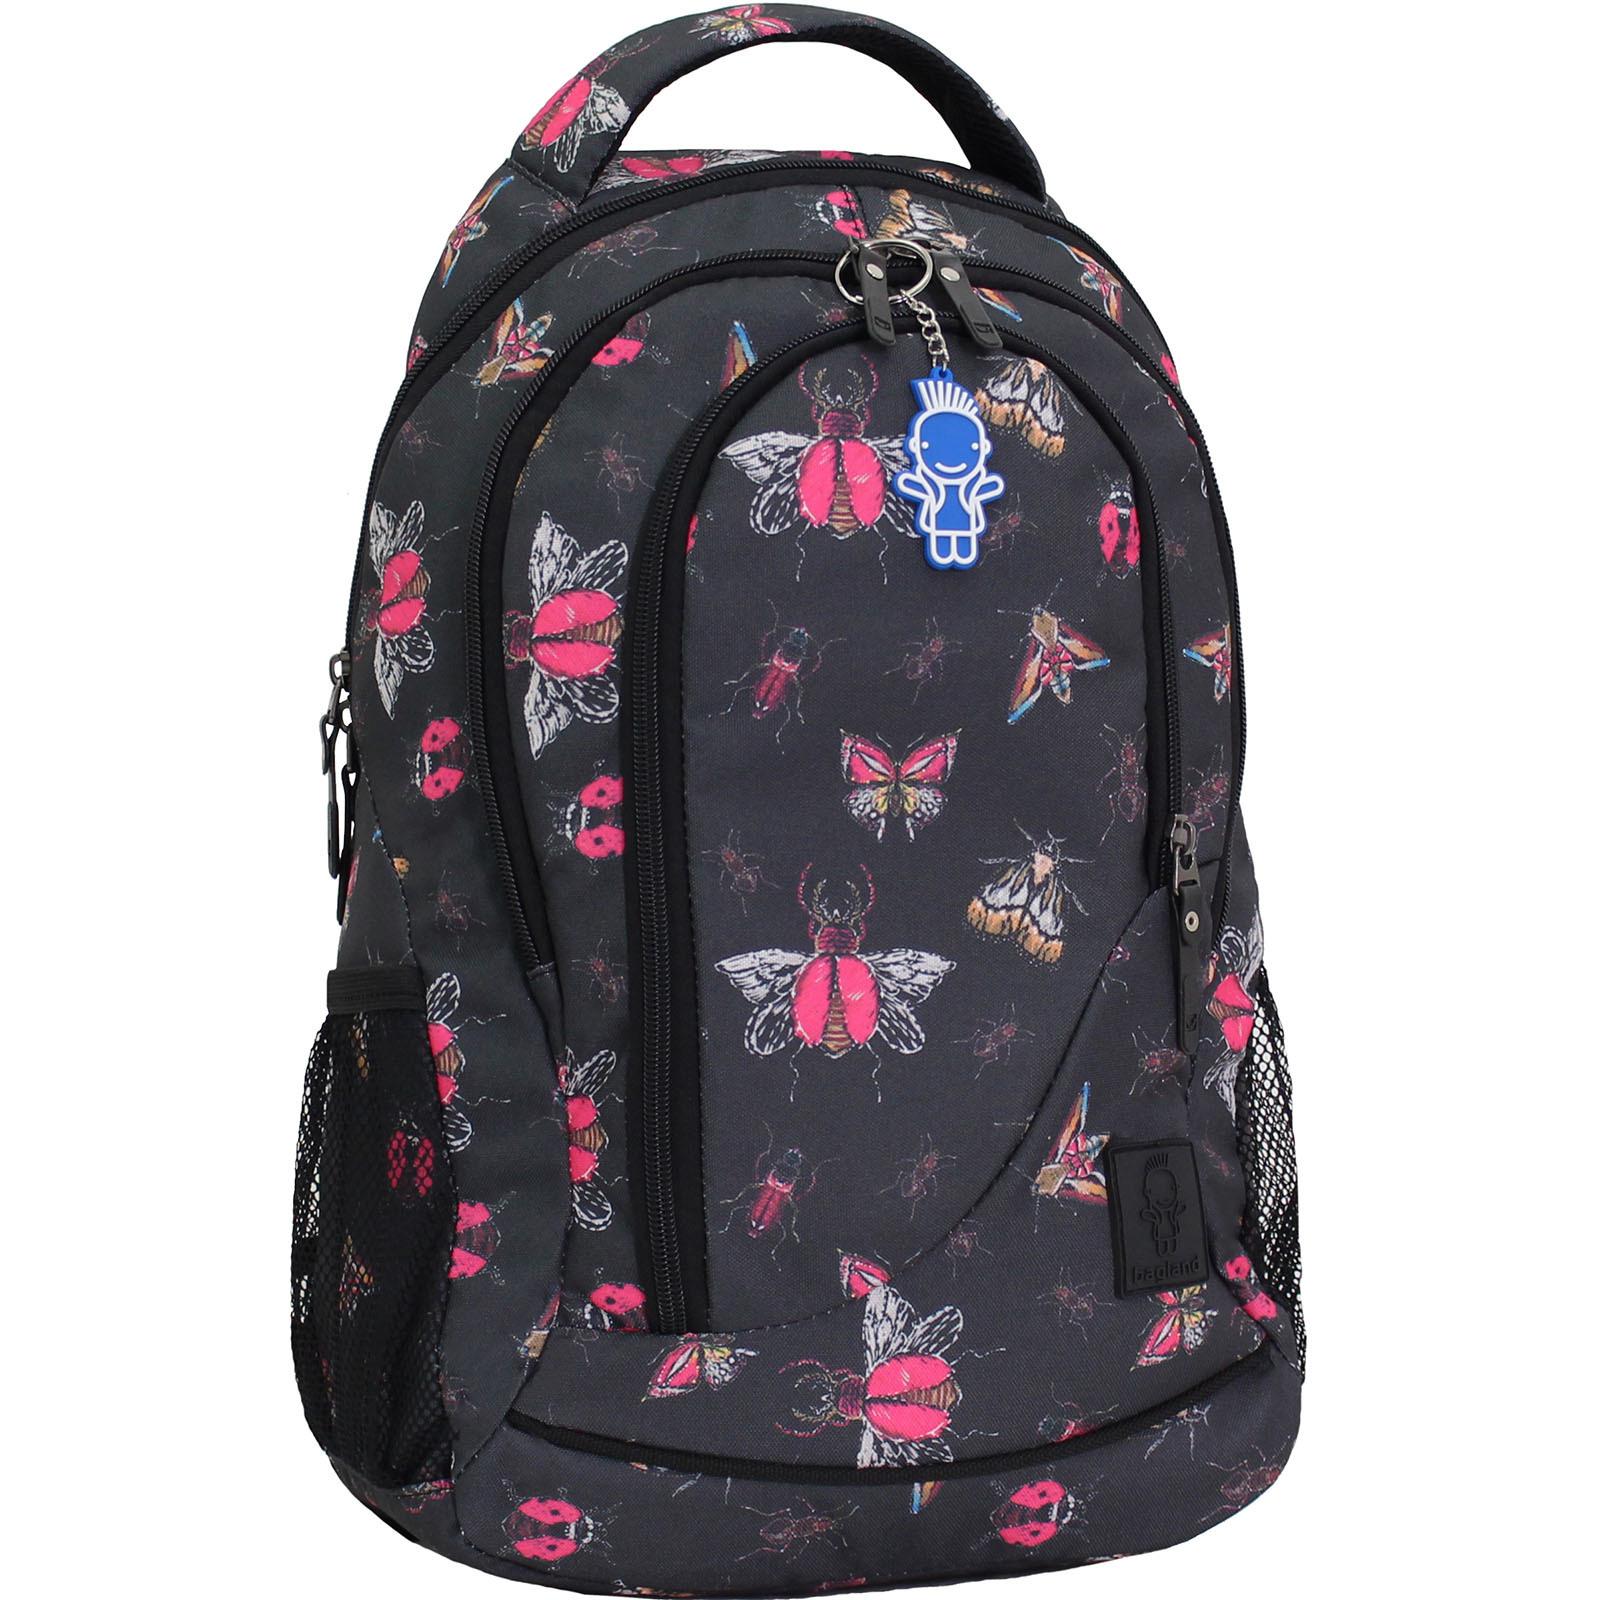 Городские рюкзаки Рюкзак Bagland Бис 19 л. сублімація 154 (00556664) IMG_9447.JPG